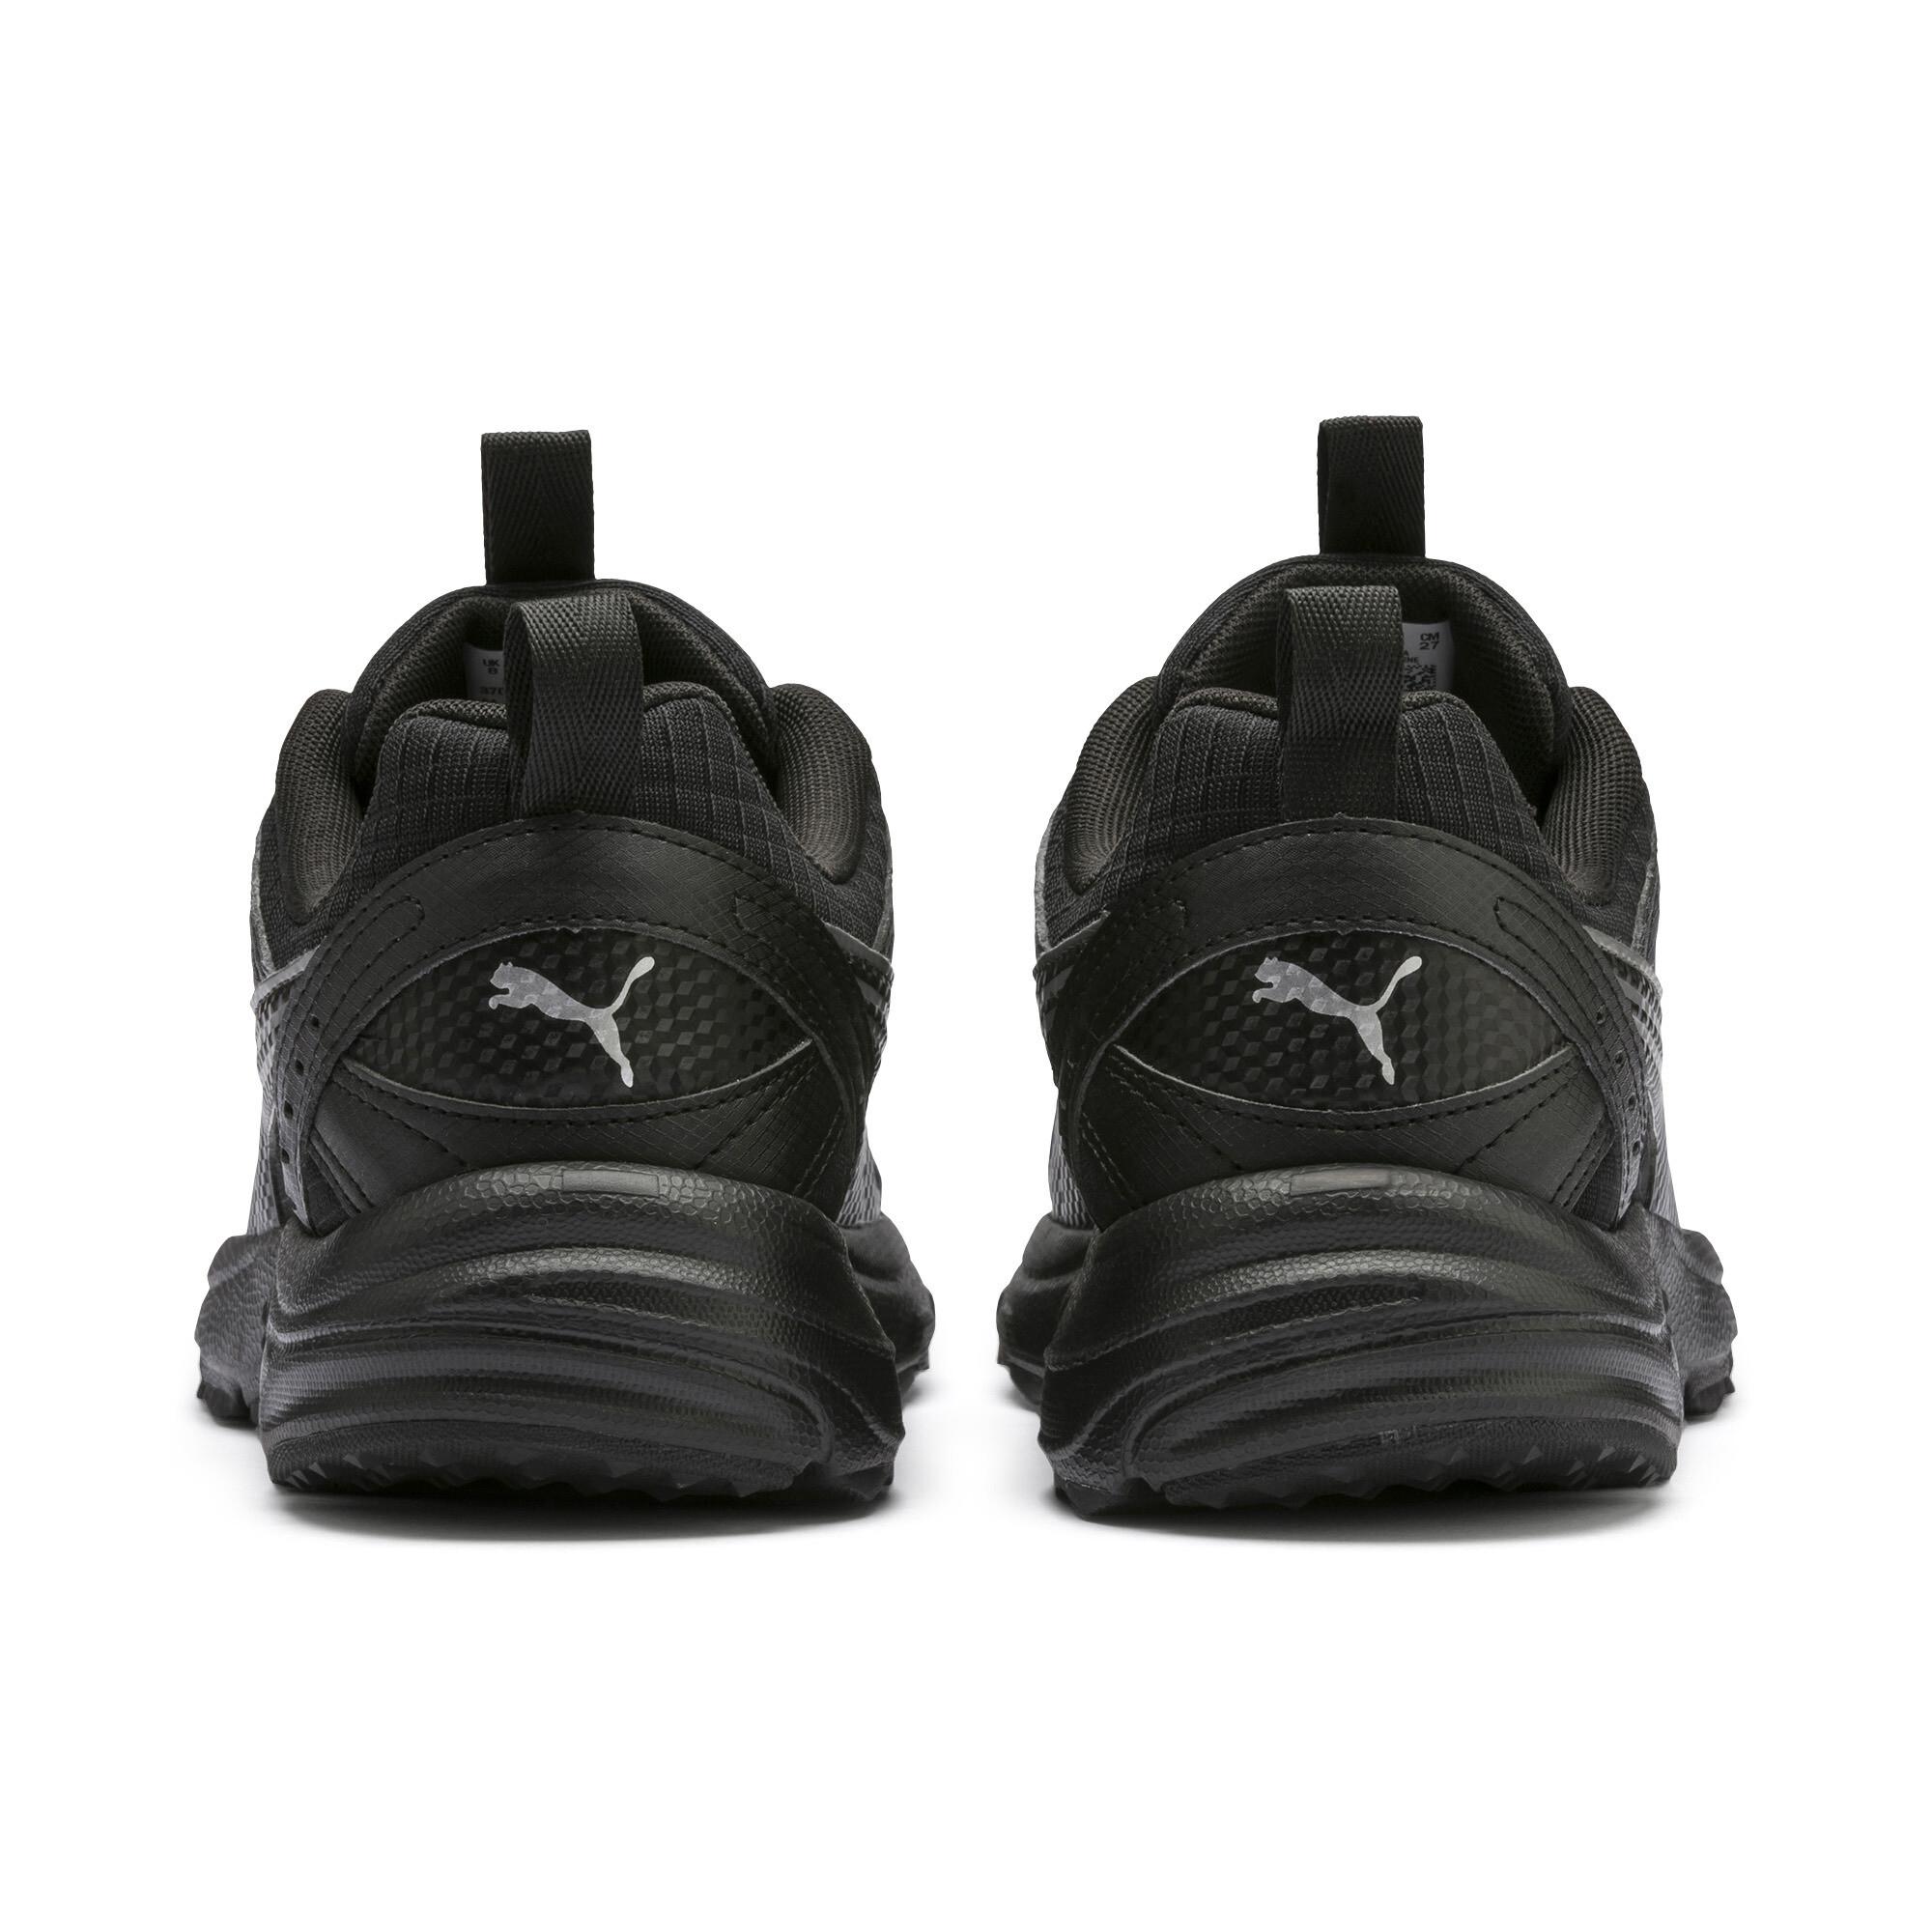 PUMA-Axis-Trail-Sneakers-Men-Shoe-Basics miniature 3